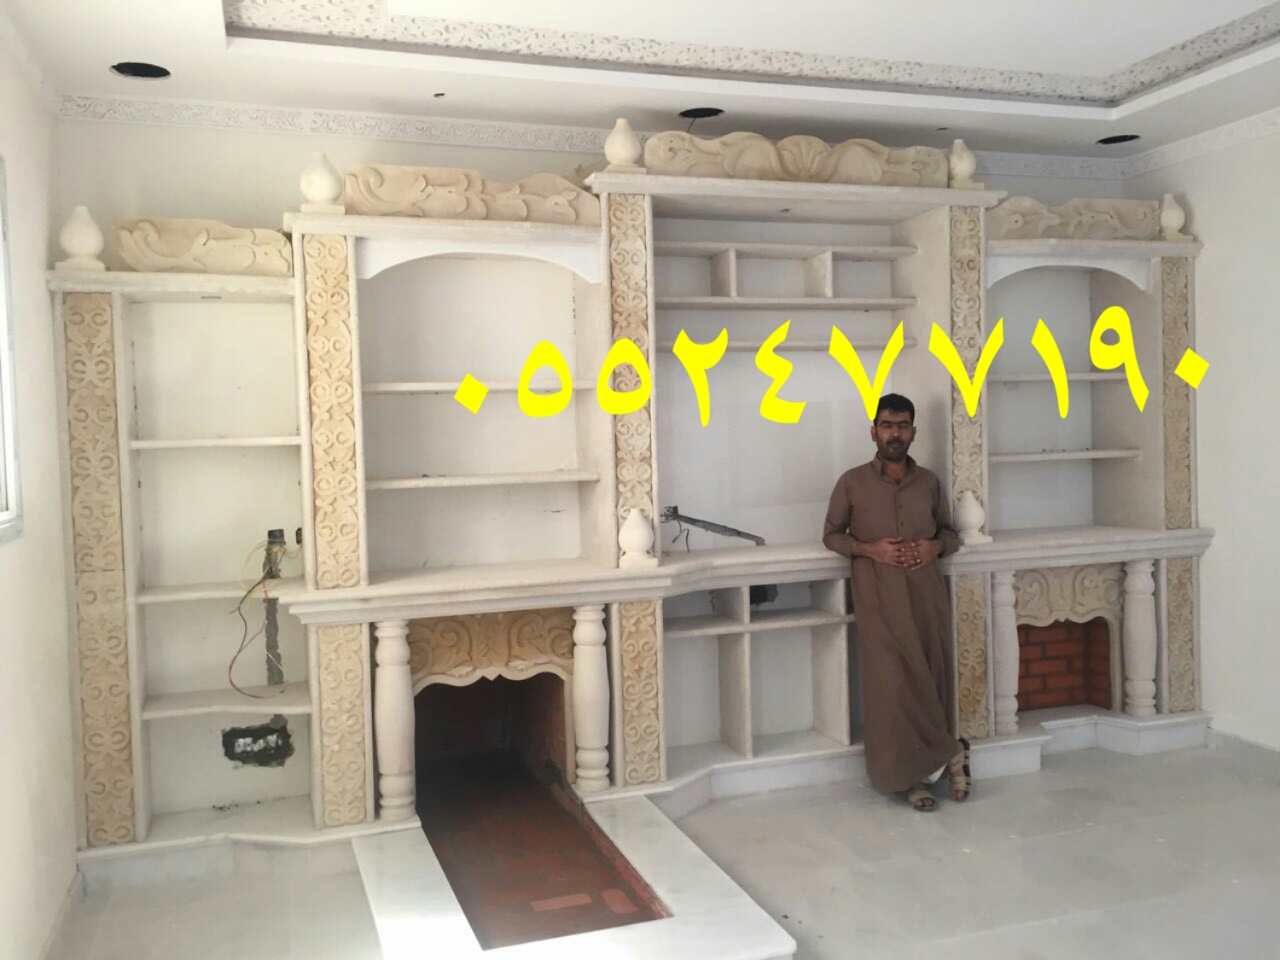 اسقف مشبات حديثة0552477190 صور مشبات جبس 0552477190